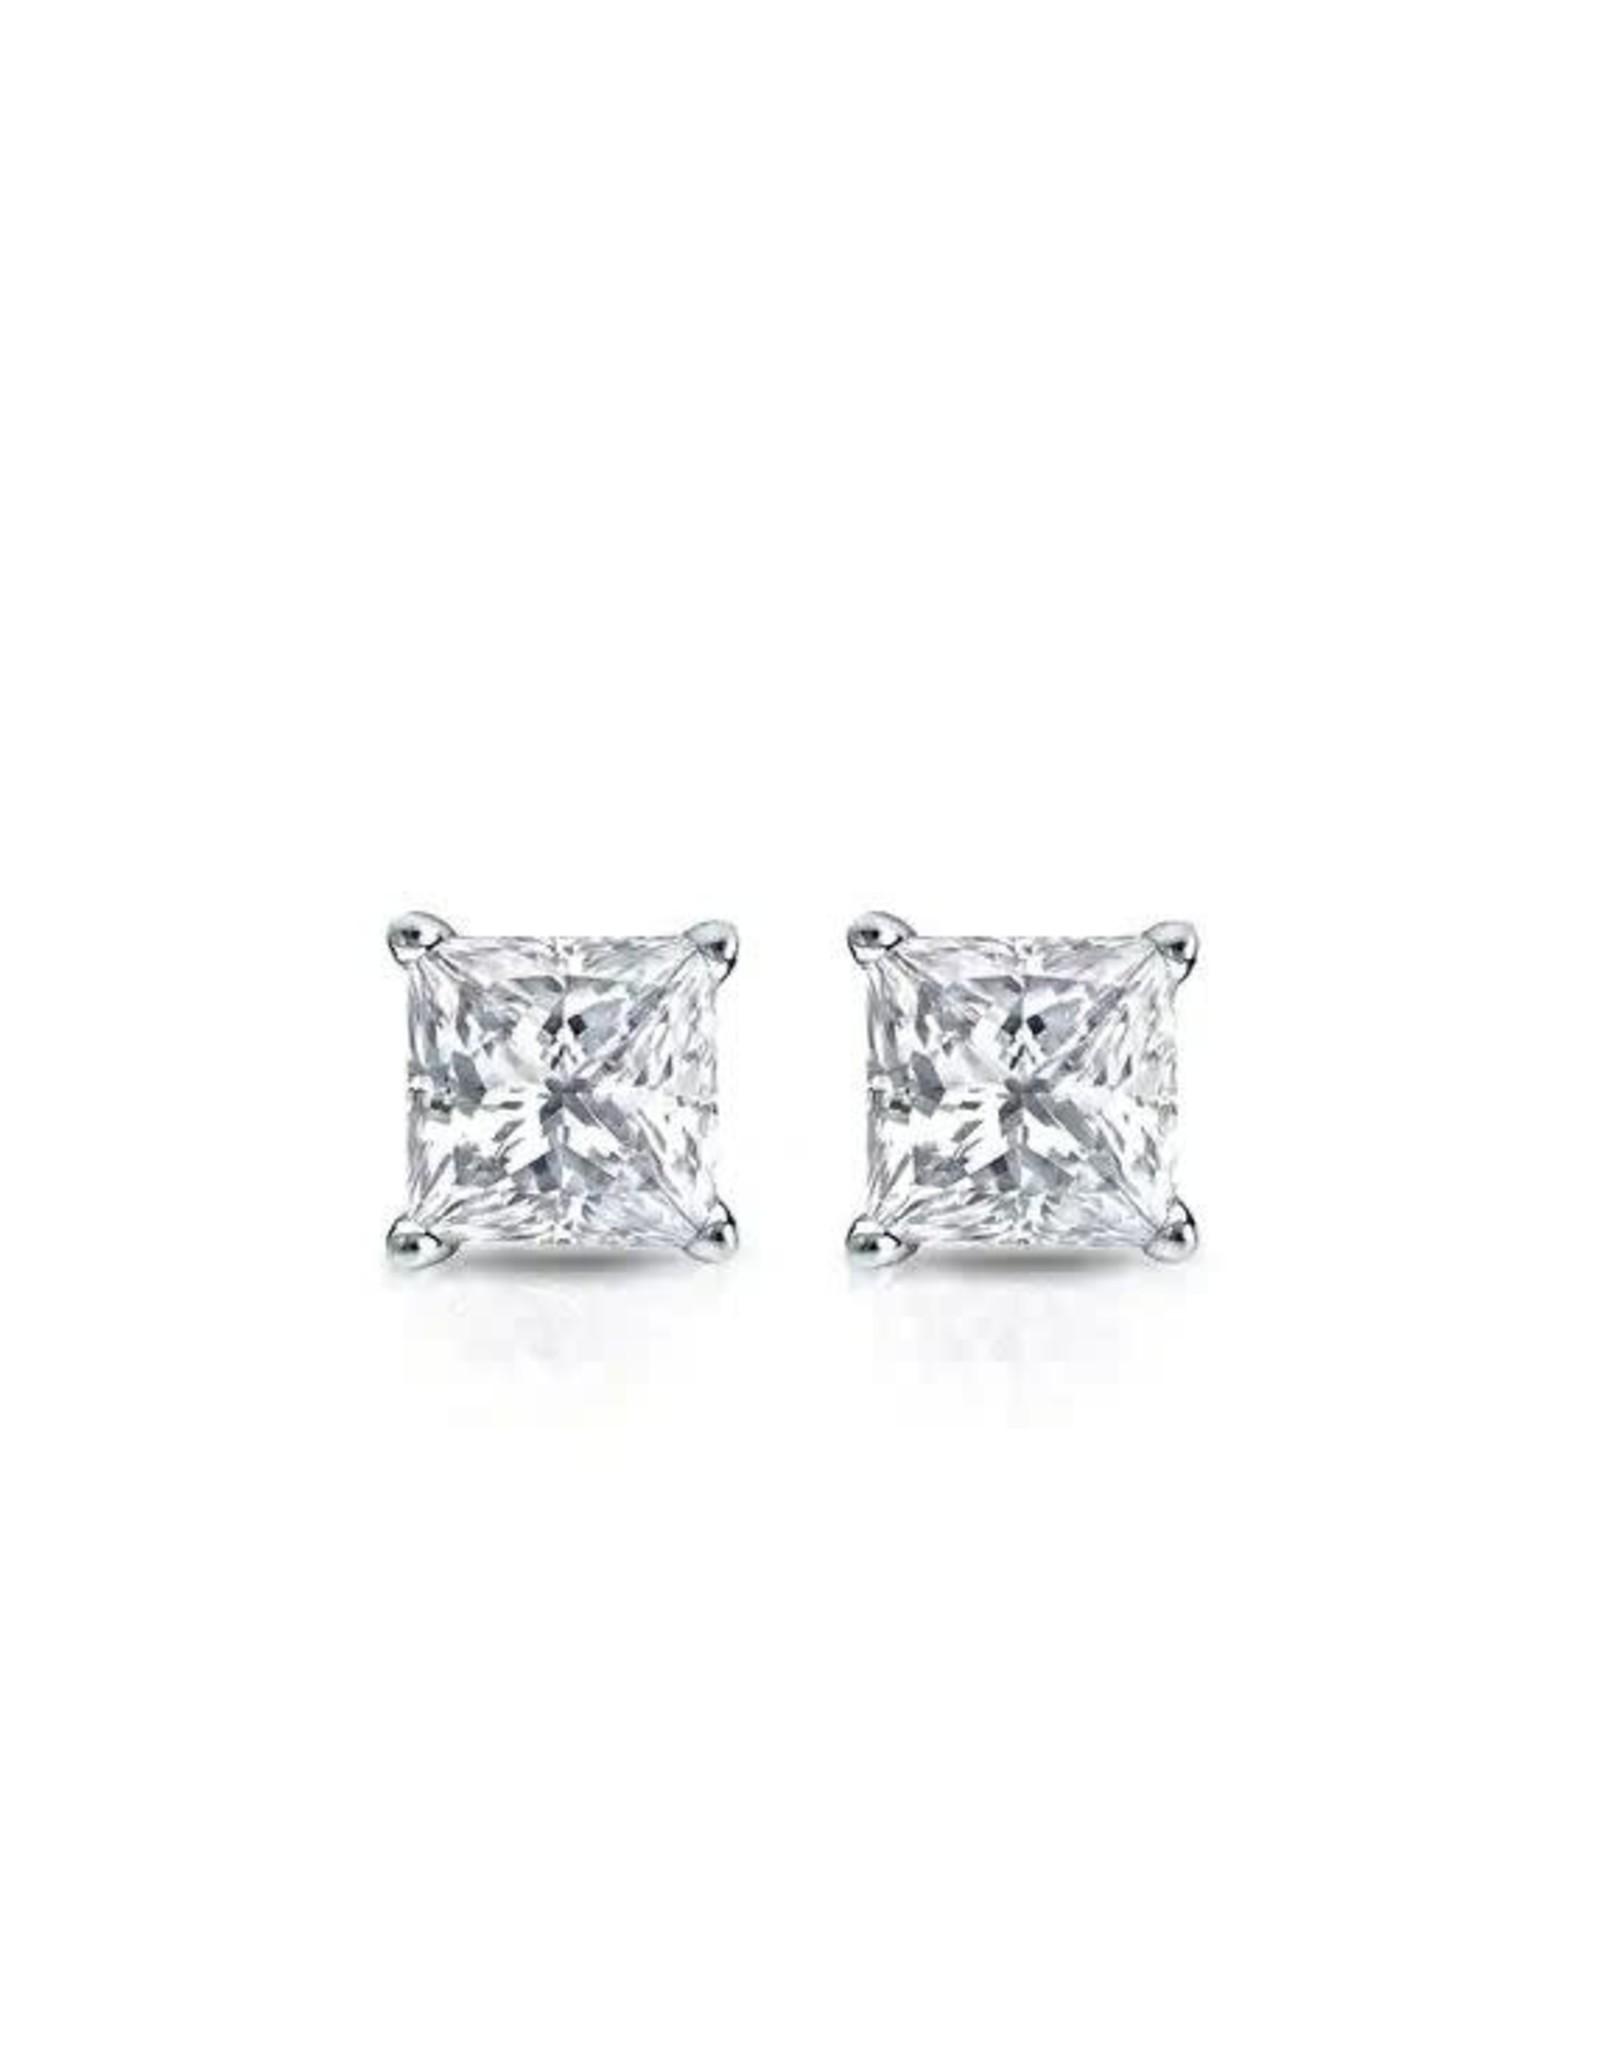 18K White Gold Princess Cut Diamond Studs, D: 0.82ct